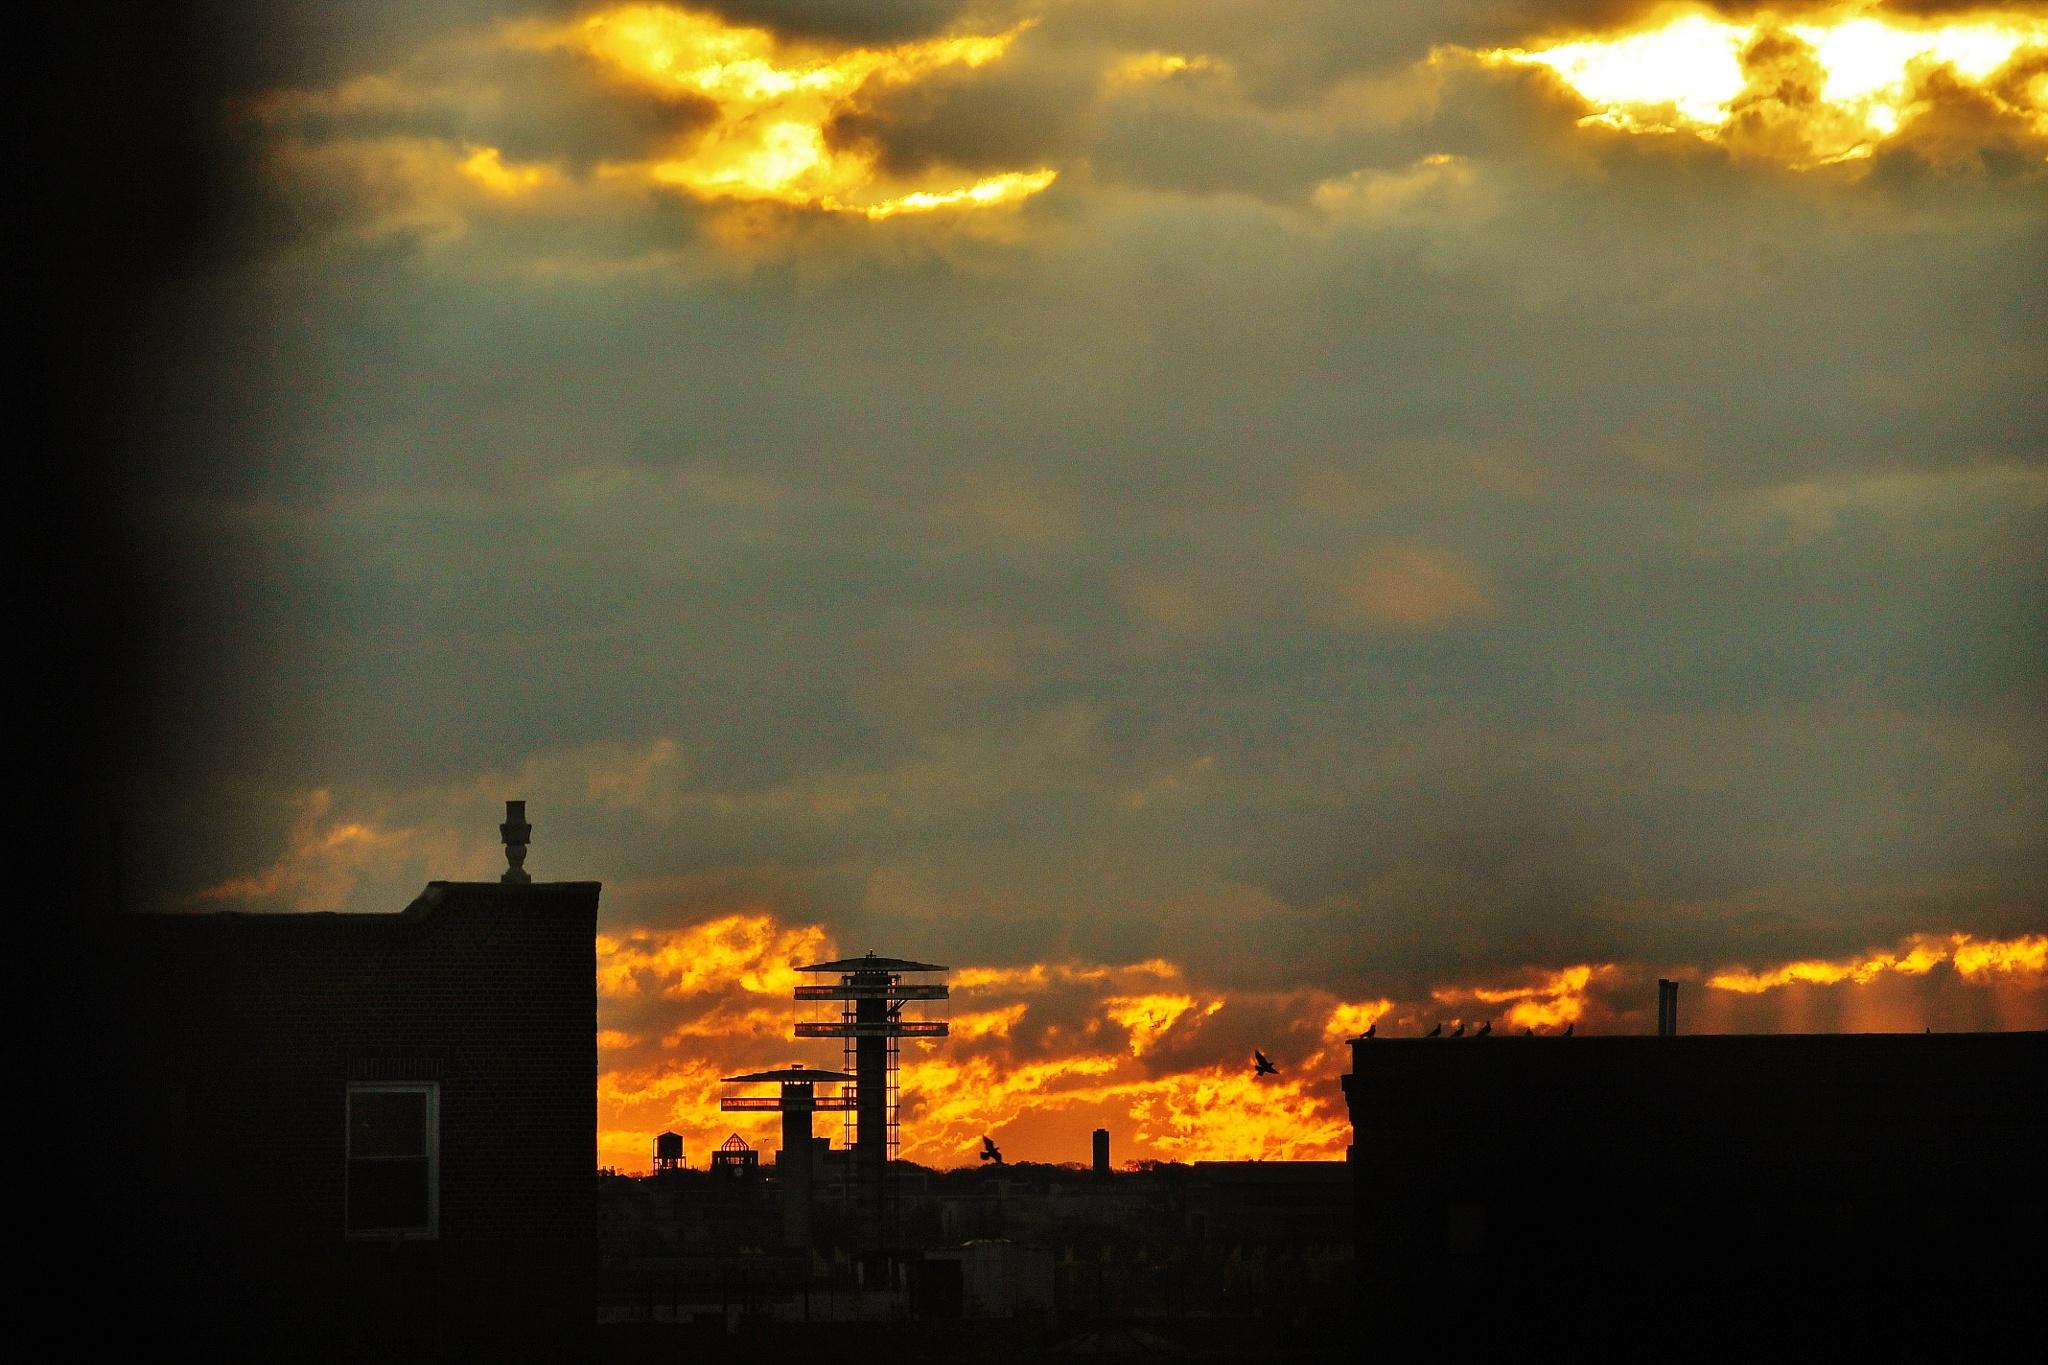 Let the sky burn, by Liborio Drogo